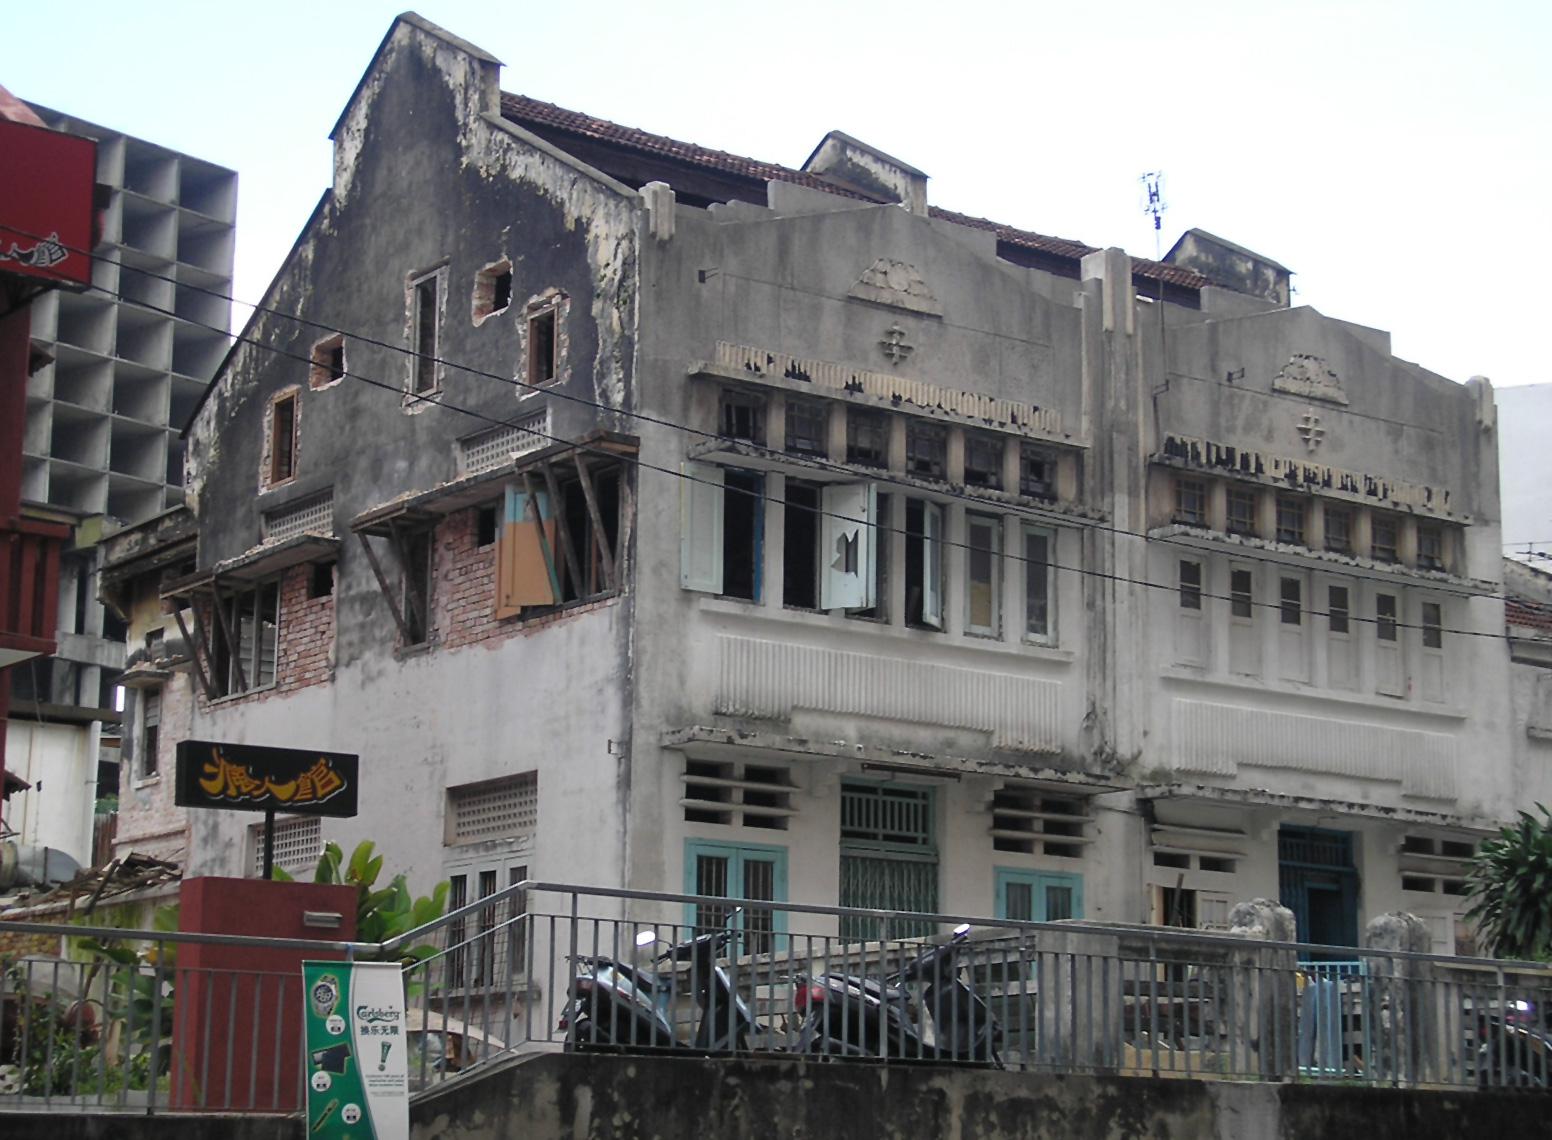 Jalan pudu images for Season 2 terrace house